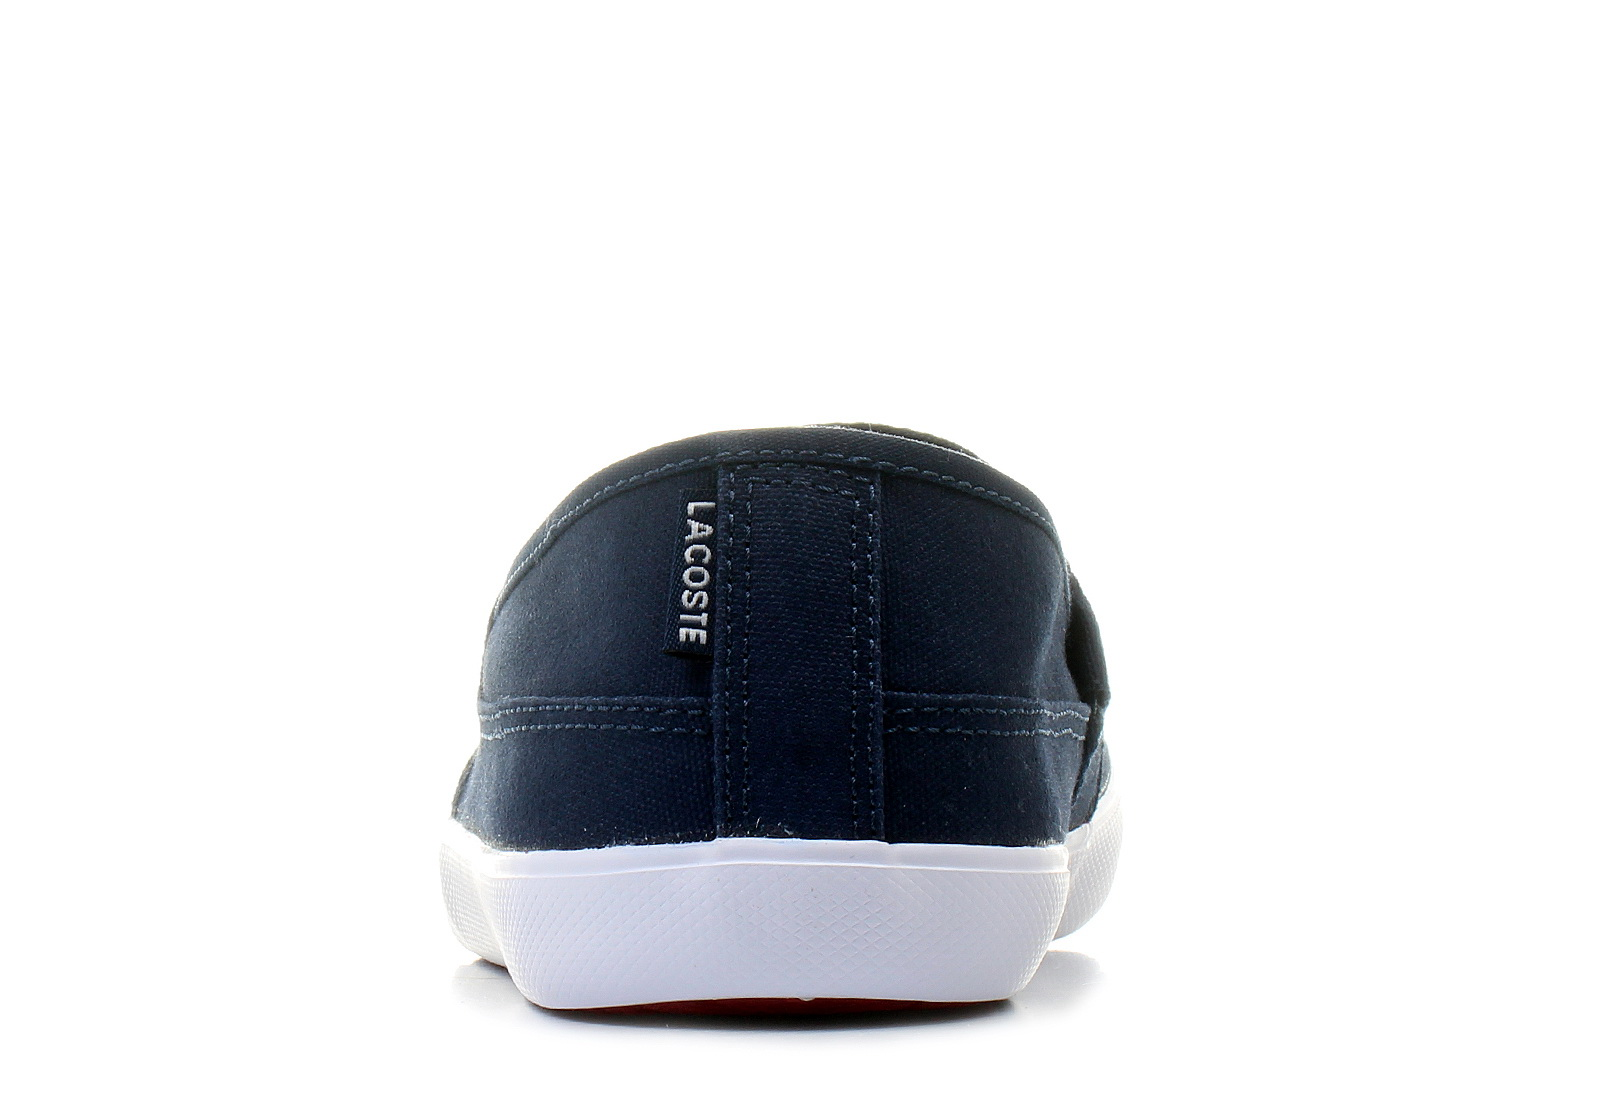 Lacoste Cipő - Marice - 171cam1071-db4 - Office Shoes Magyarország 288d3dd3ca